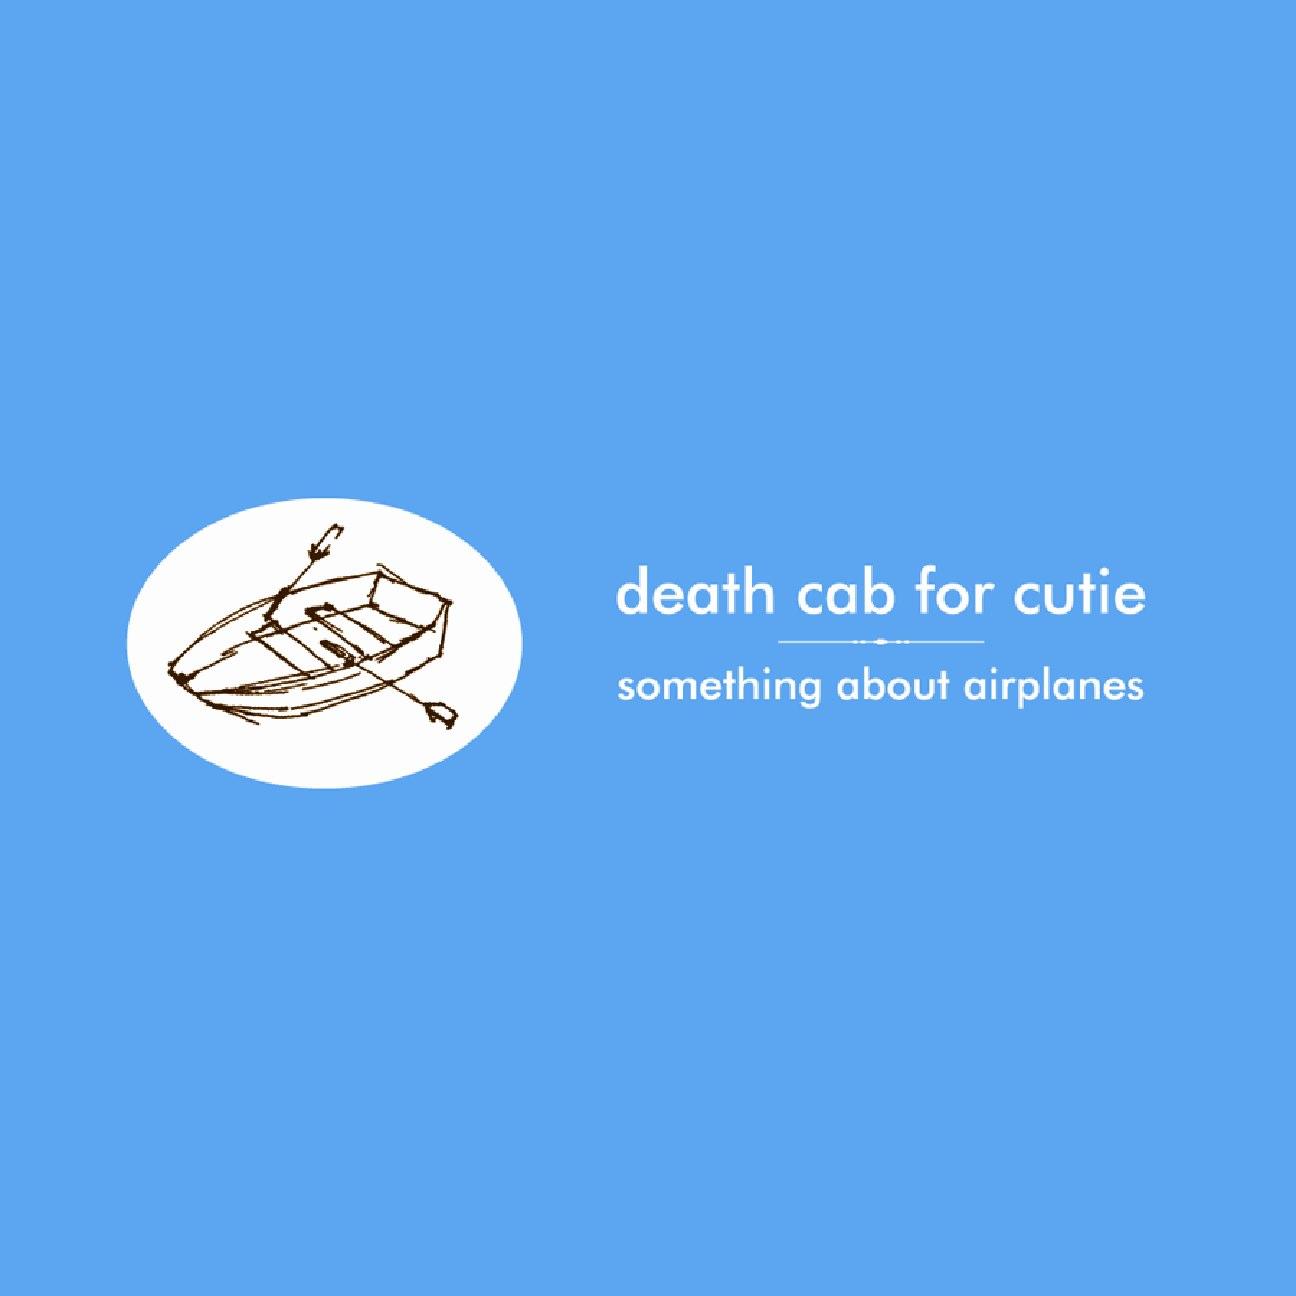 deathcab.jpg